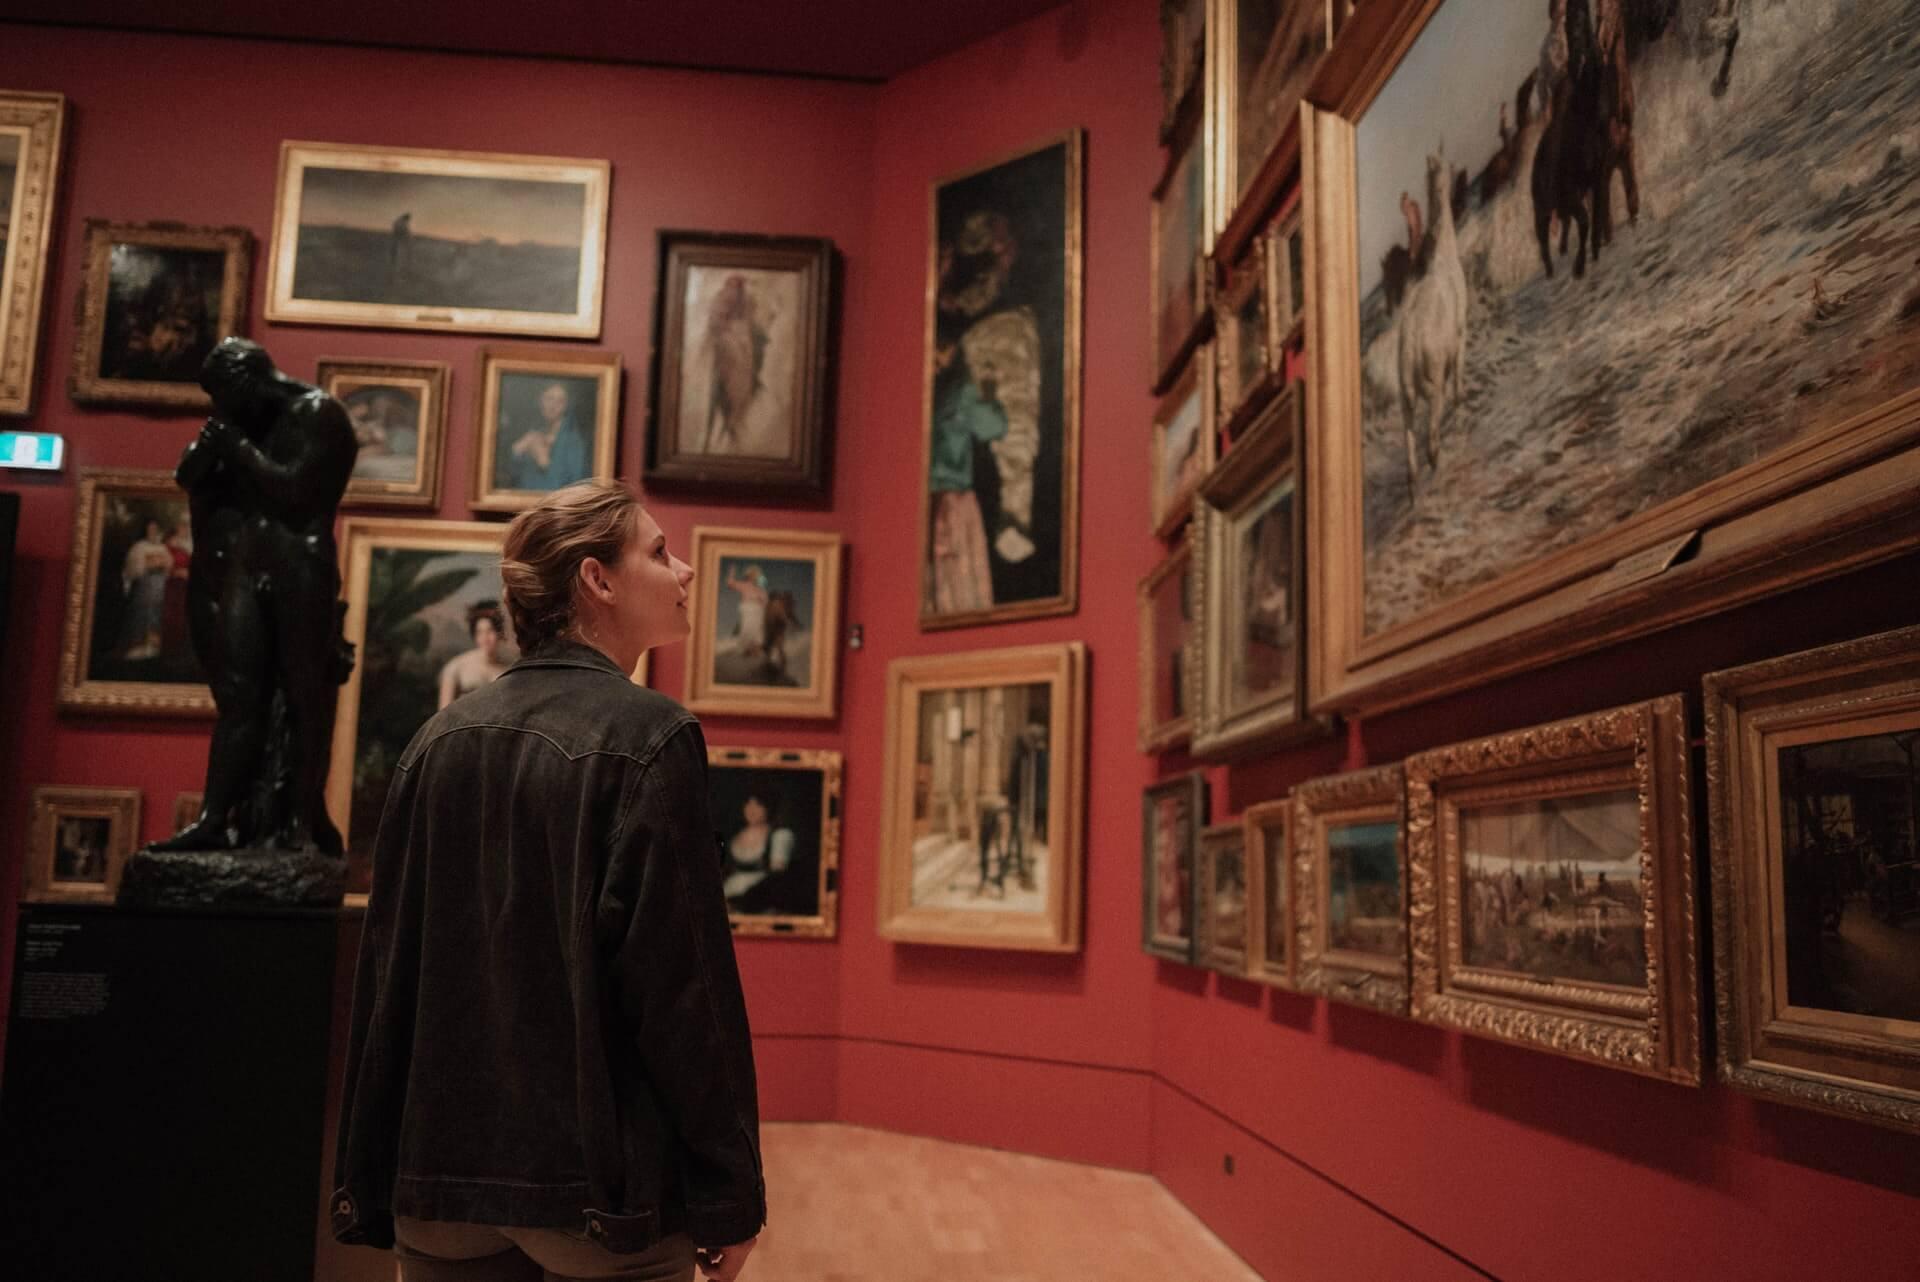 muzea na svete